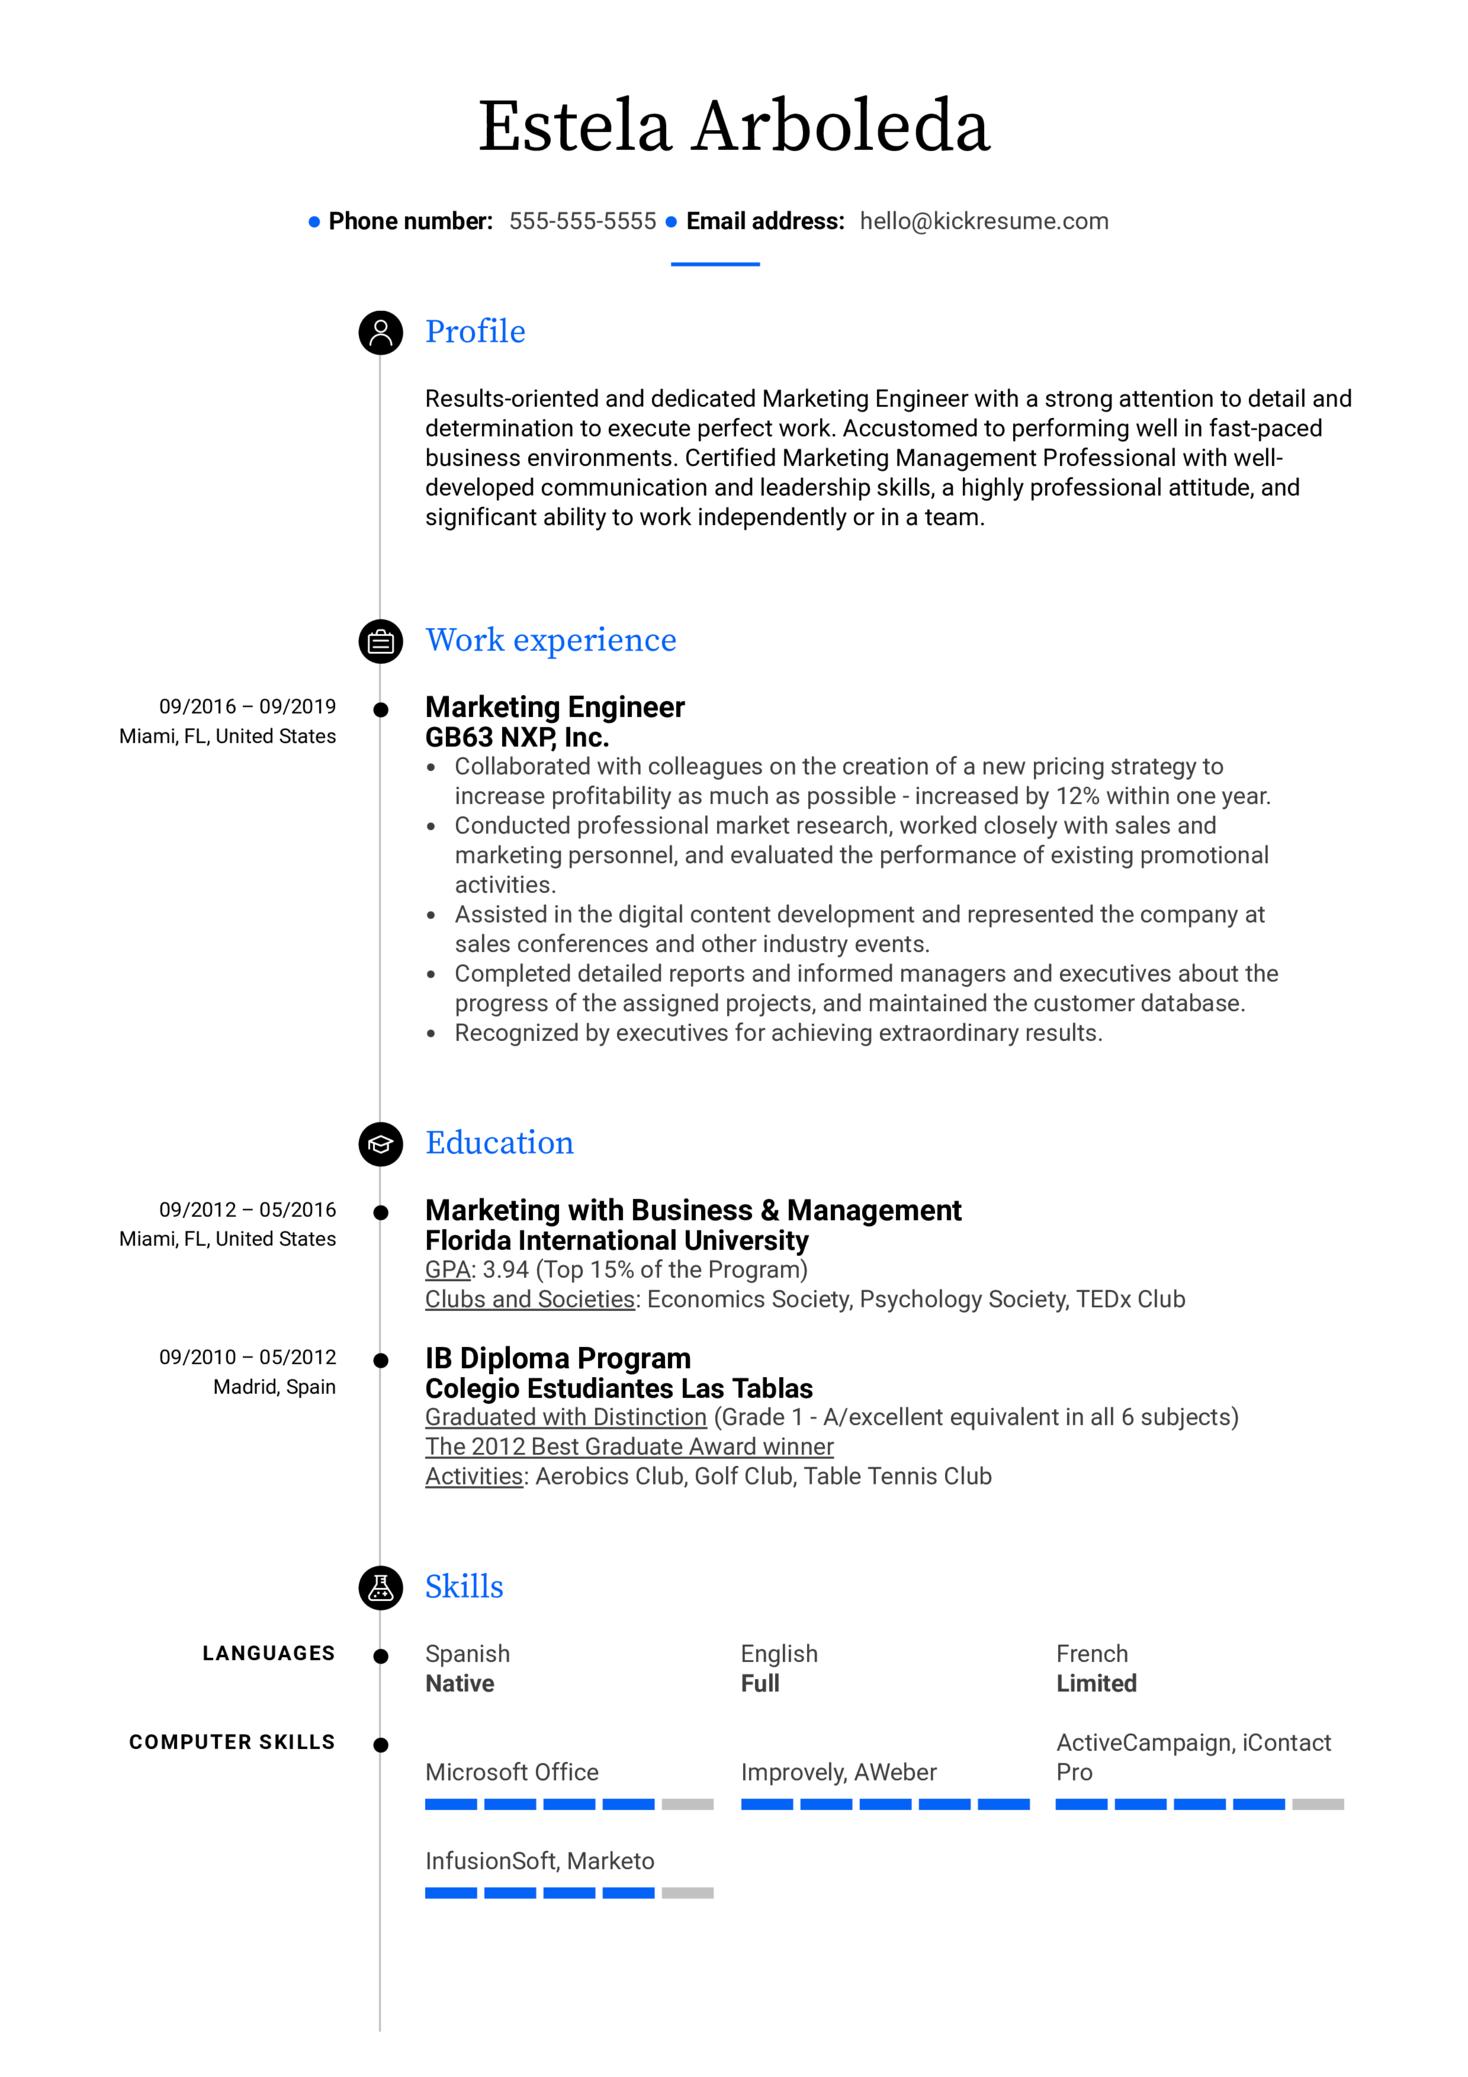 Marketing Engineer Resume Sample (Part 1)